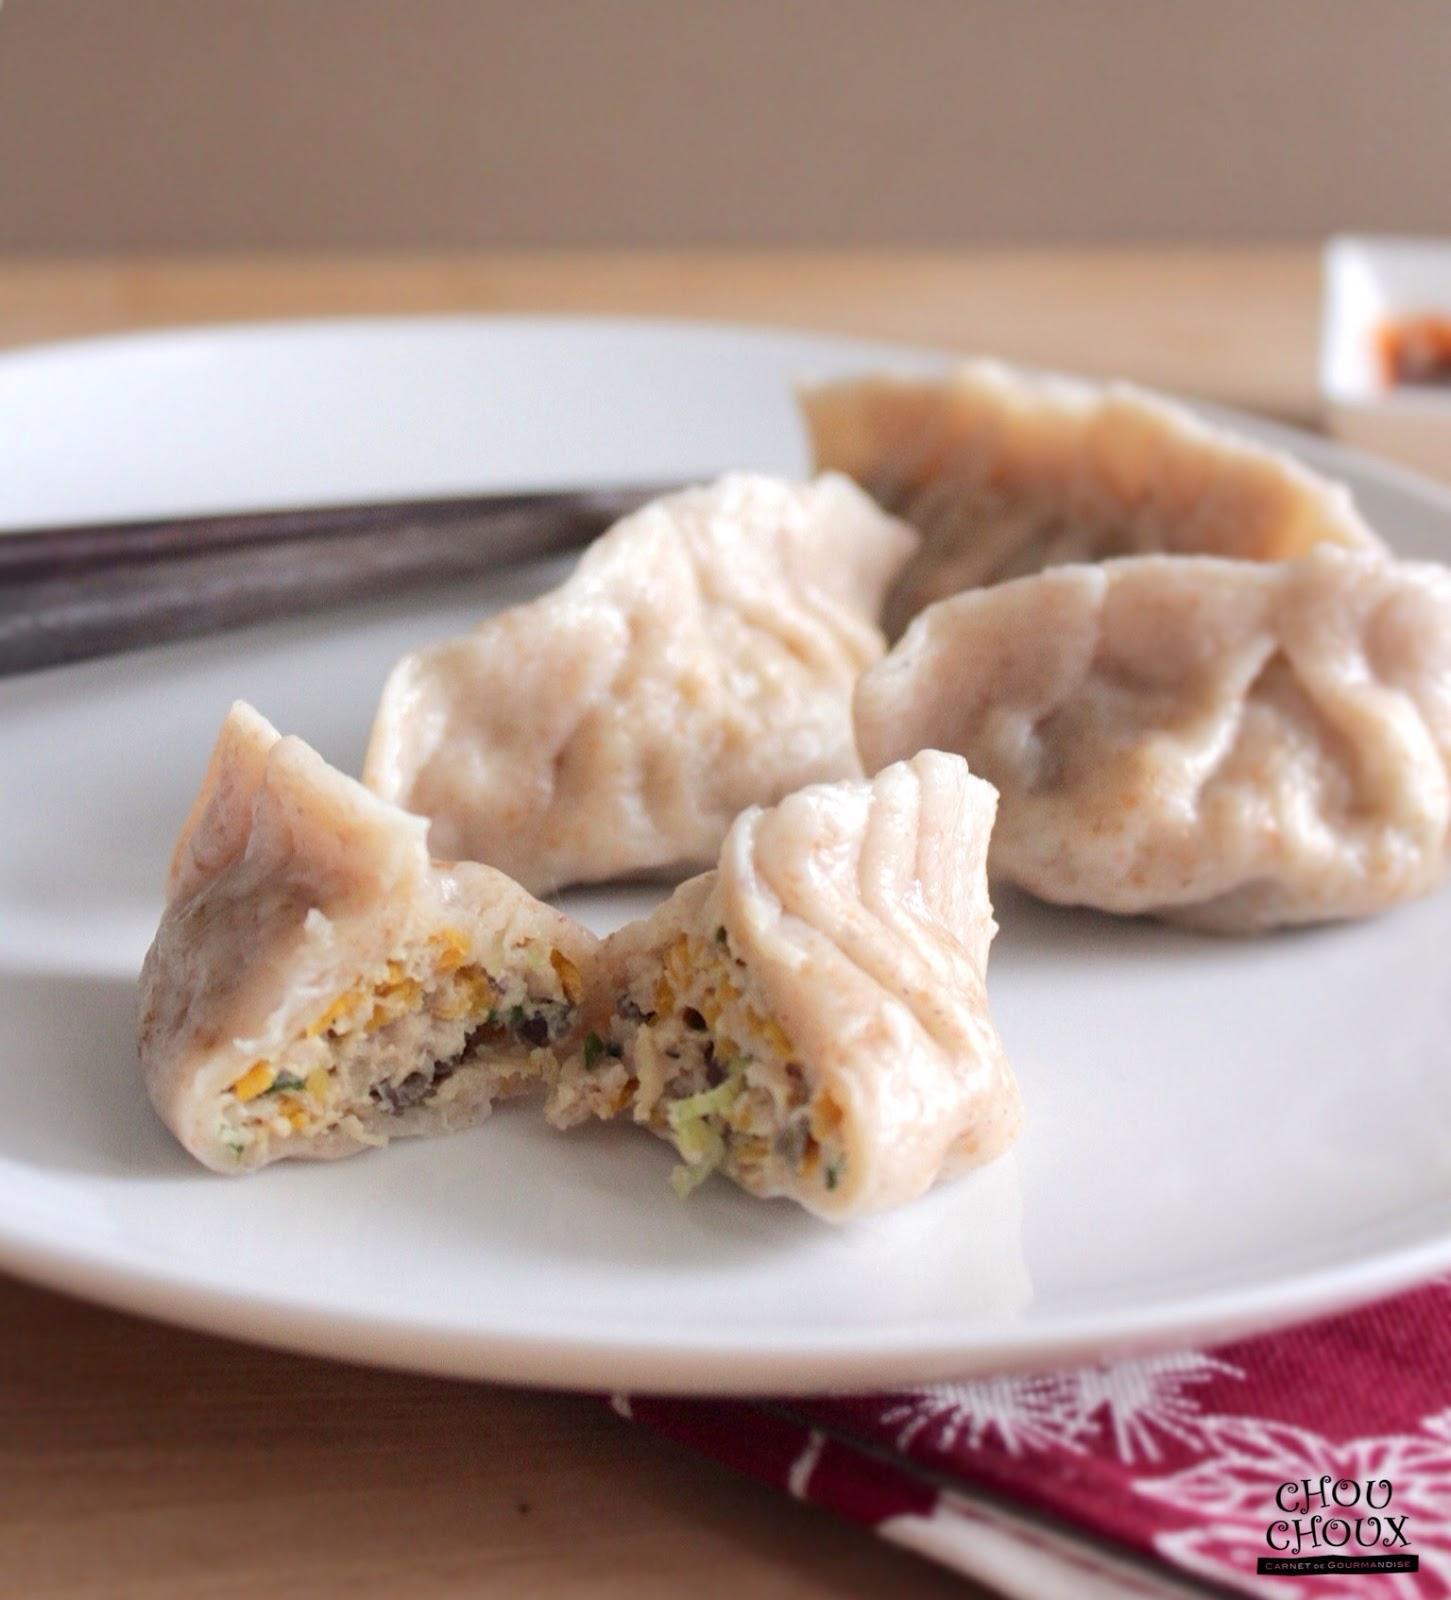 My Chouchoux: Butternut Squash and Turkey Dumplings 南瓜火雞水餃